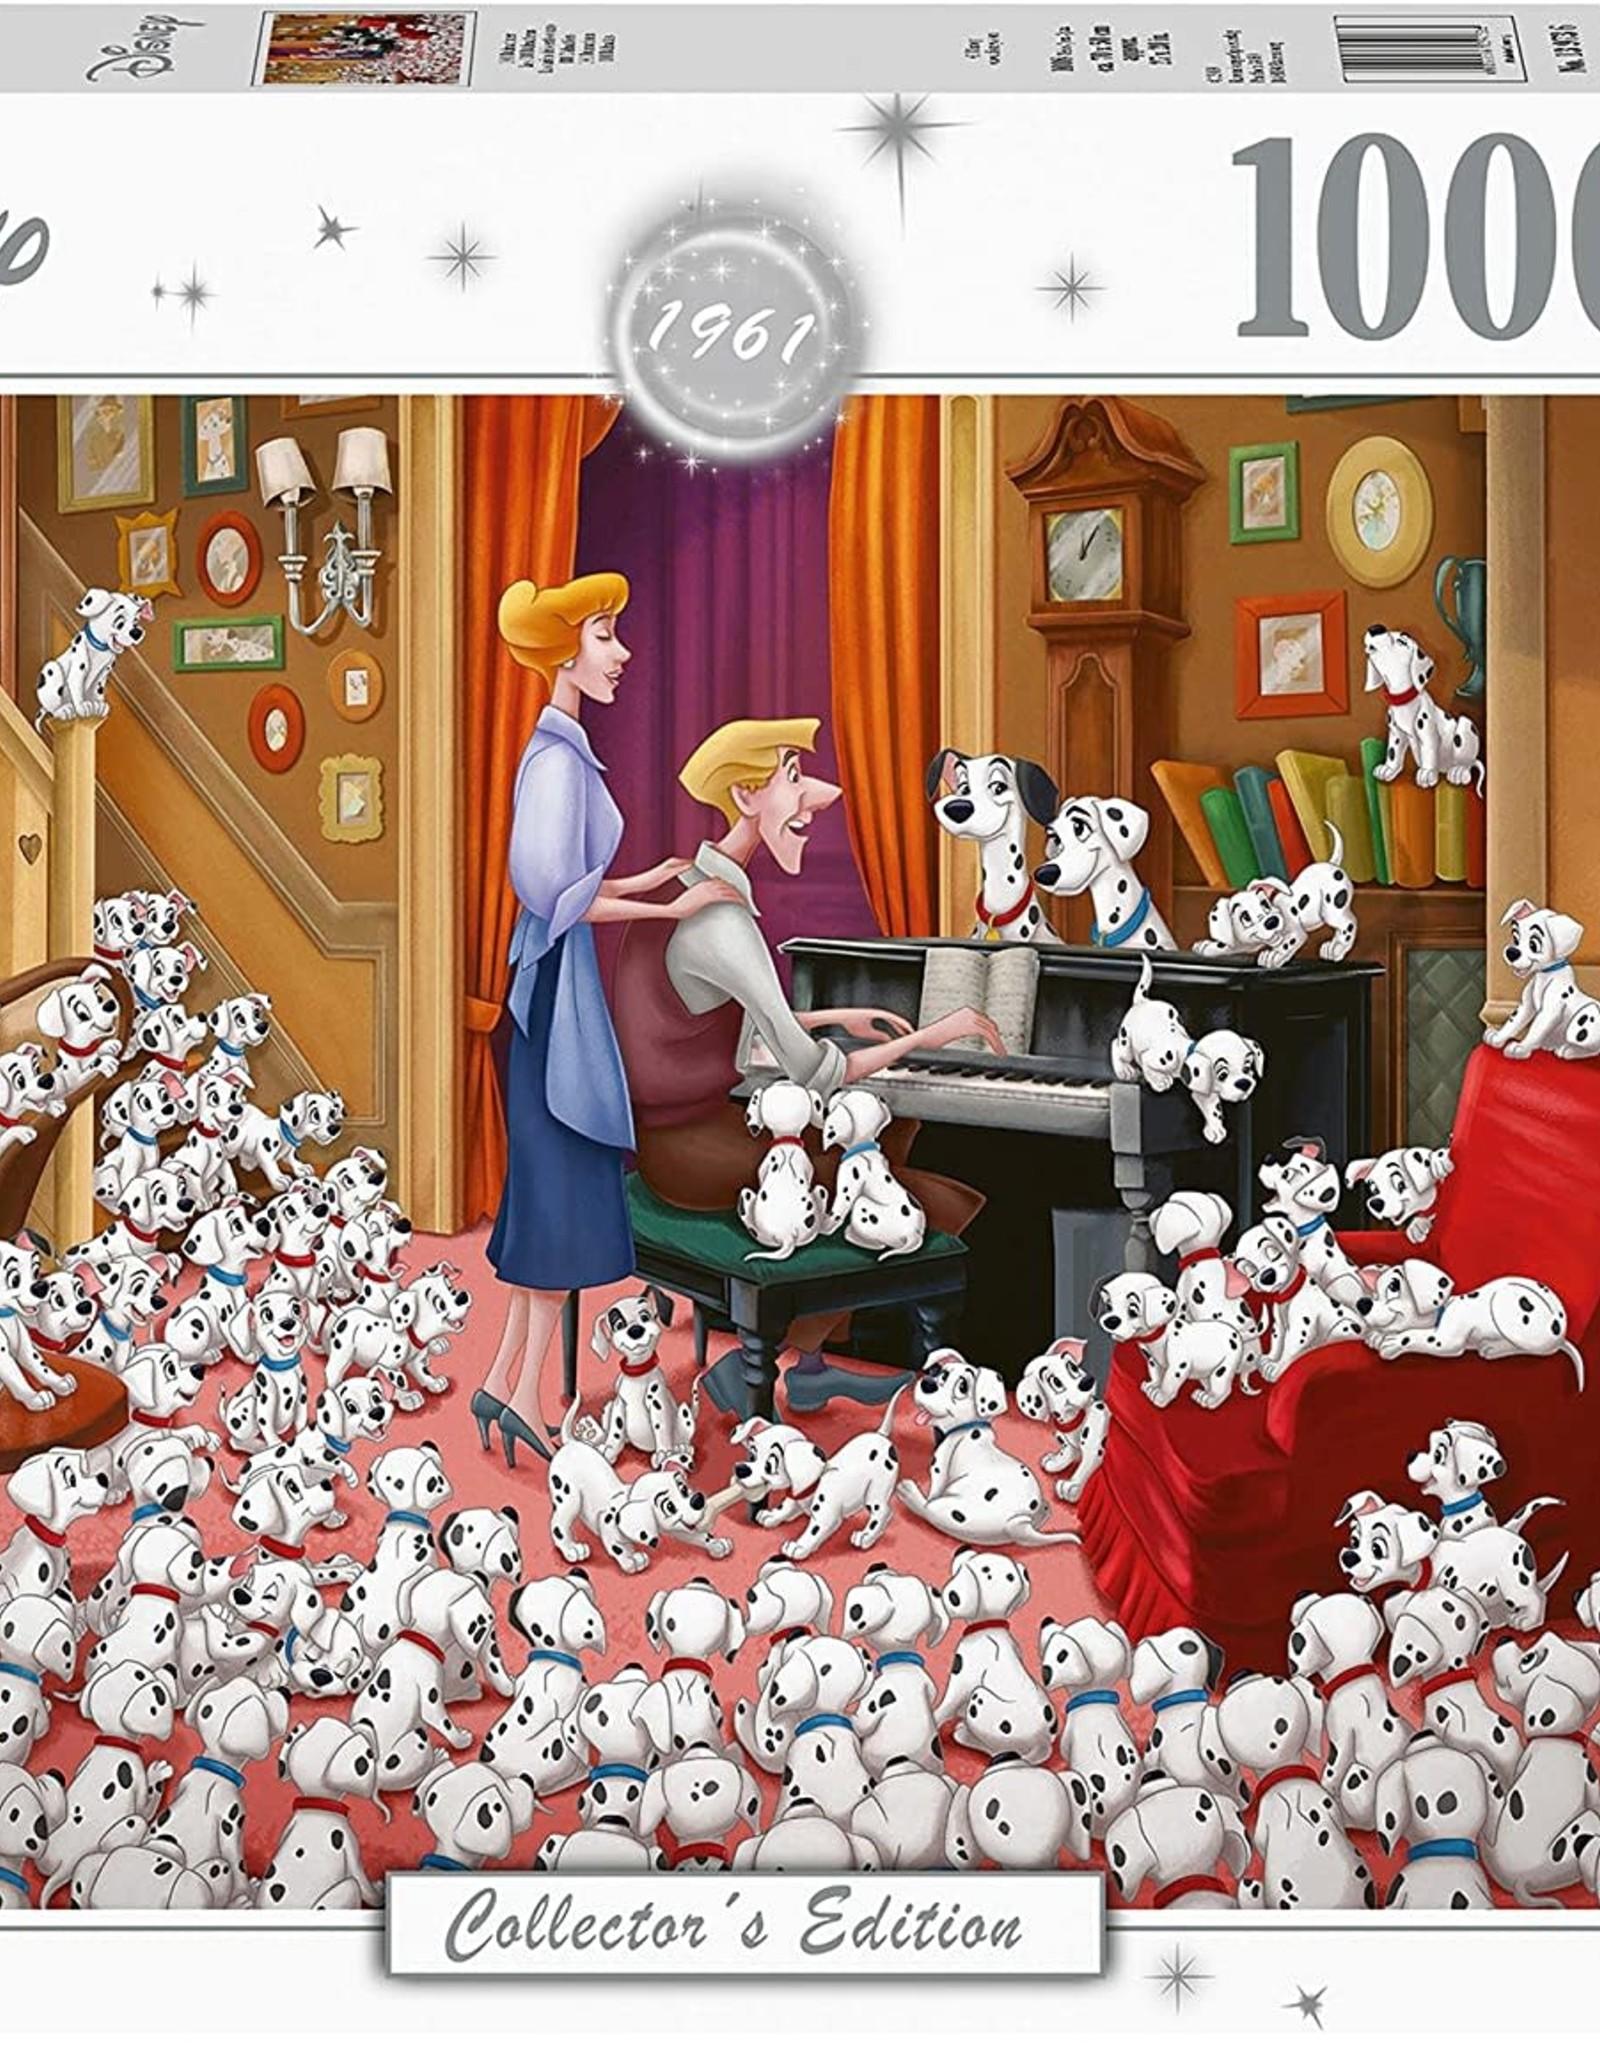 Ravensburger 101 Dalmatians 1000 Pc